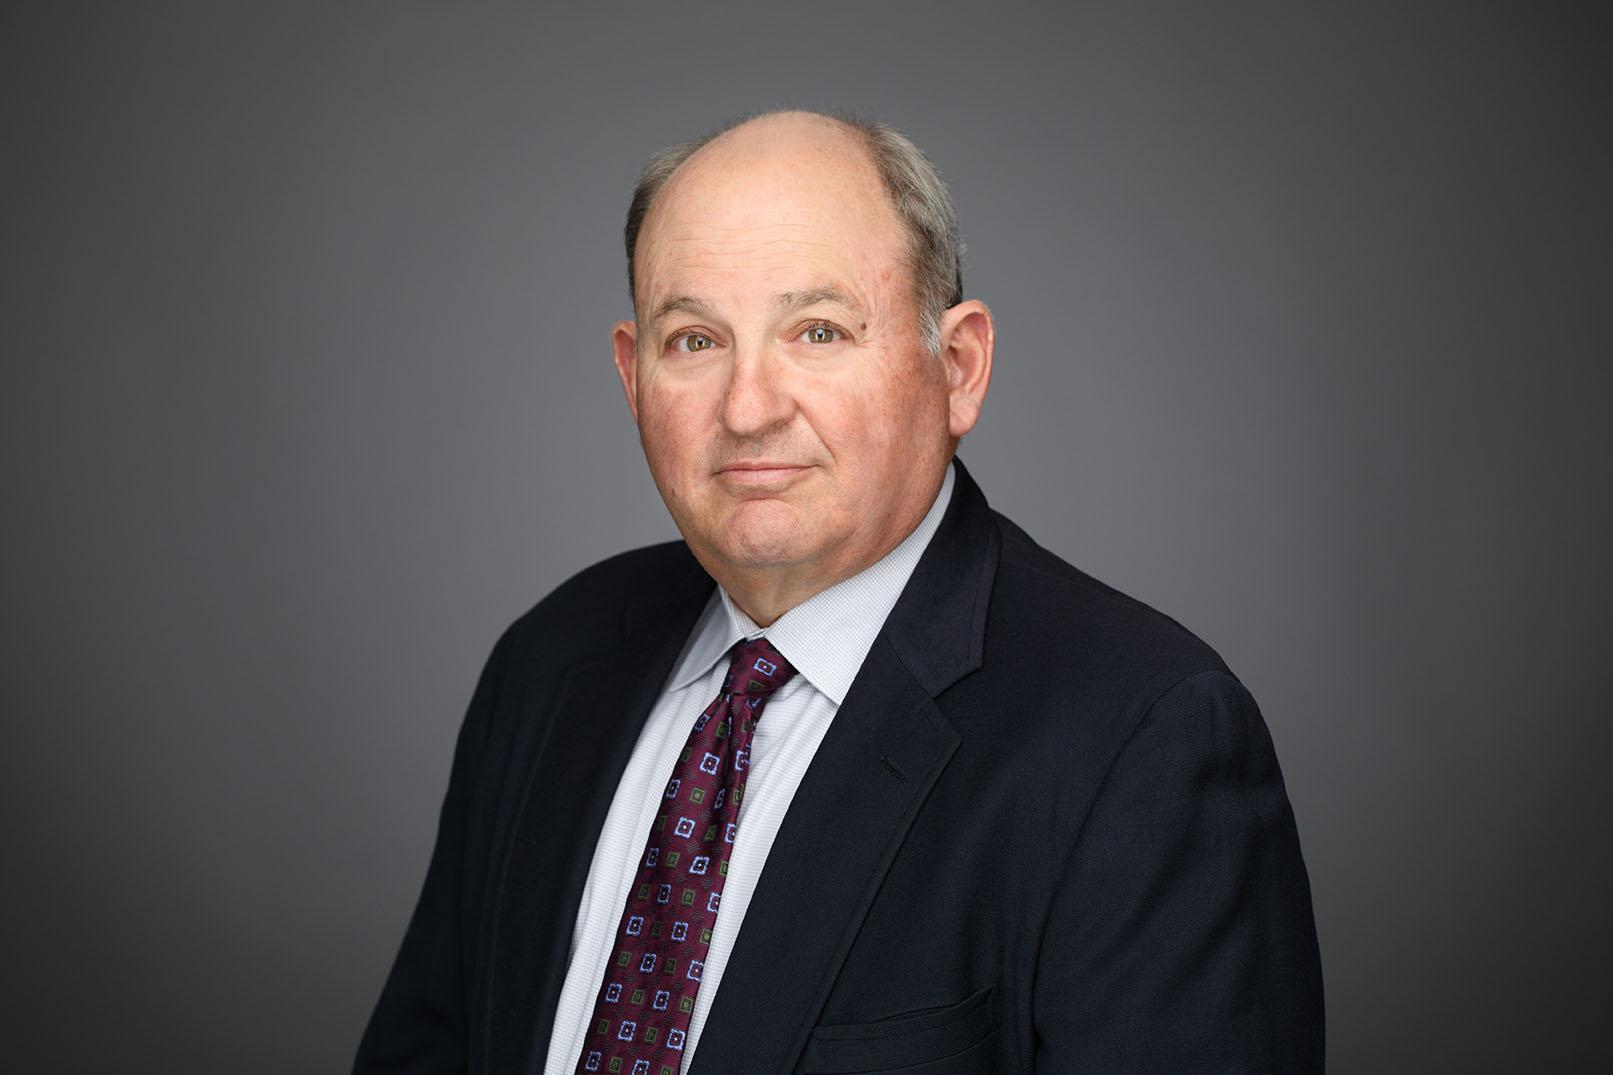 Robert J. Franco